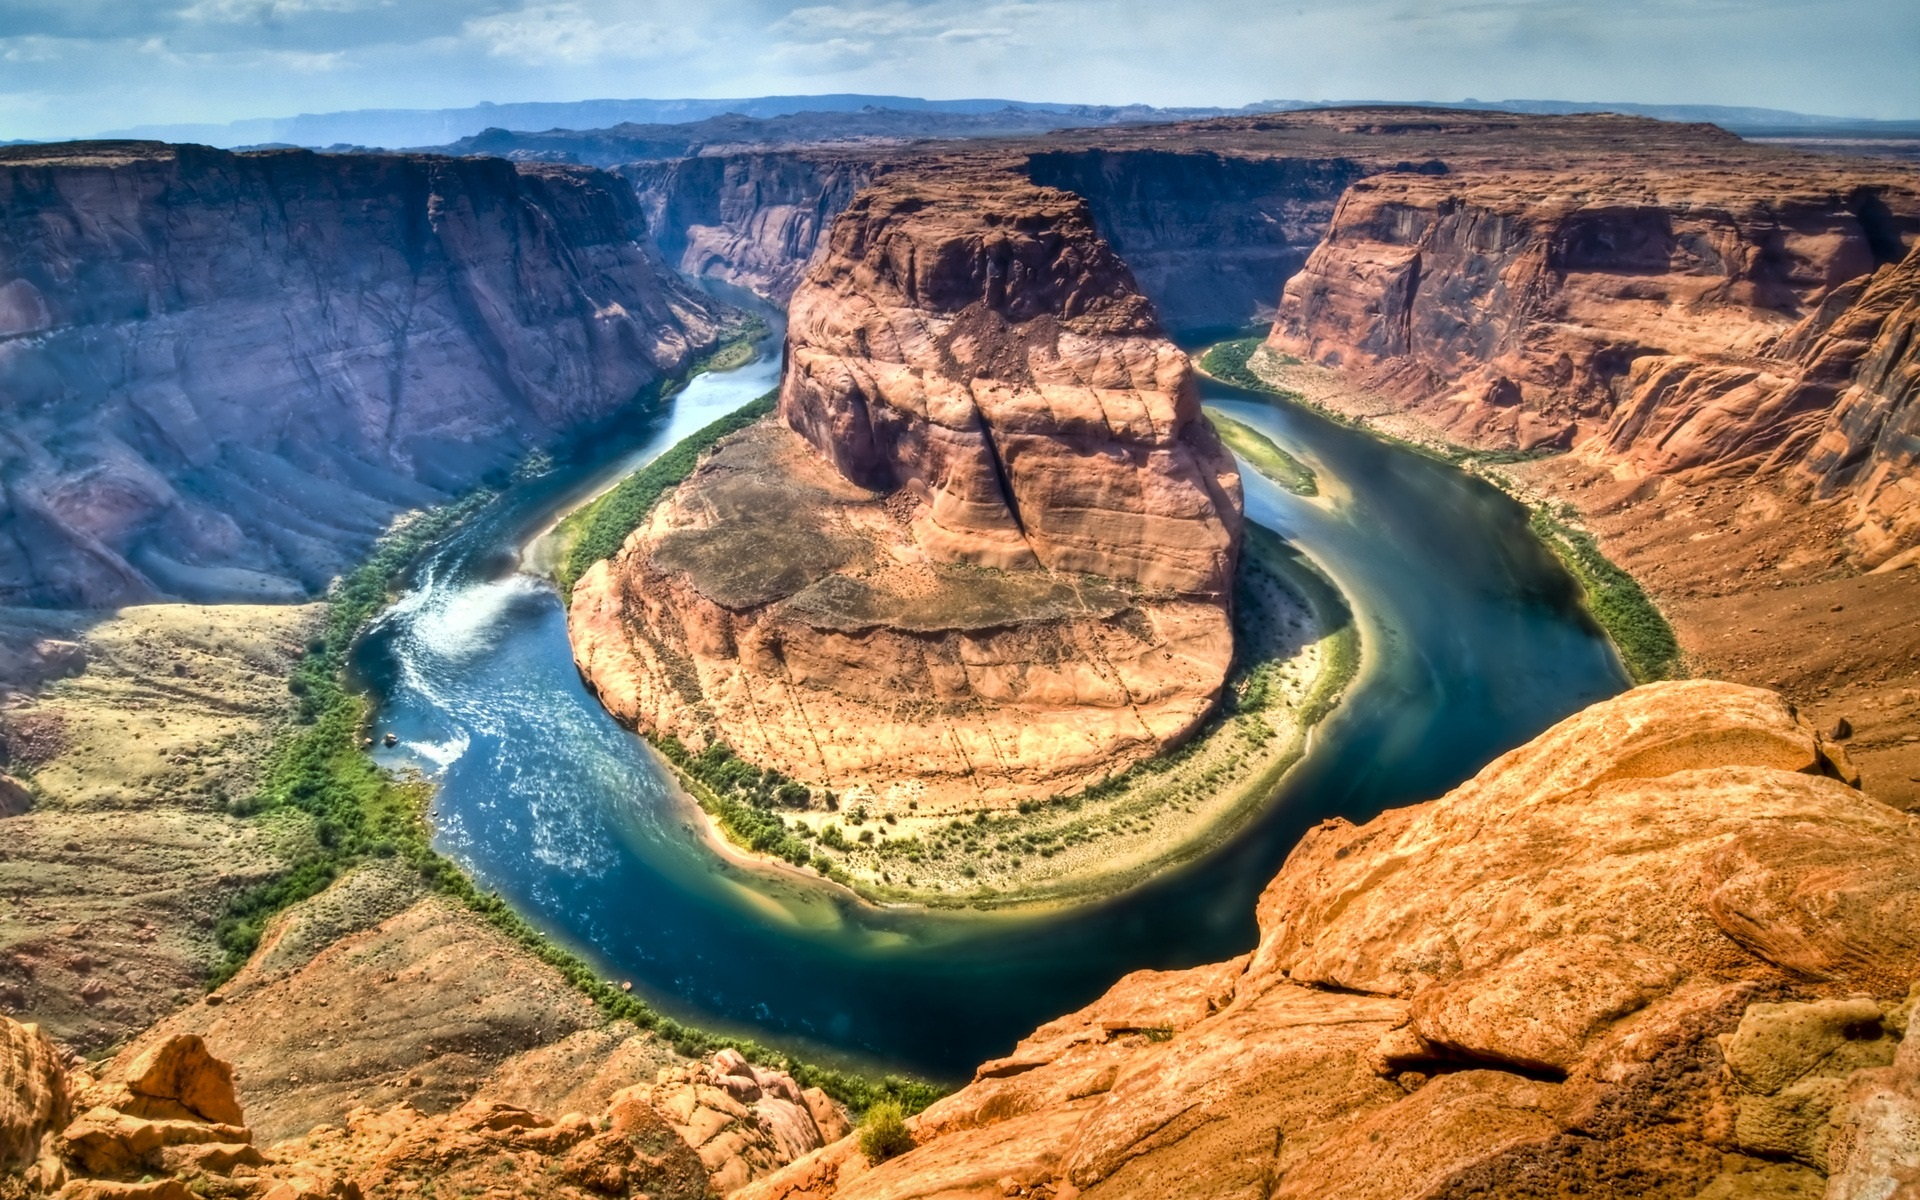 canyon wallpapers grand canyon wallpapers grand canyon wallpapers